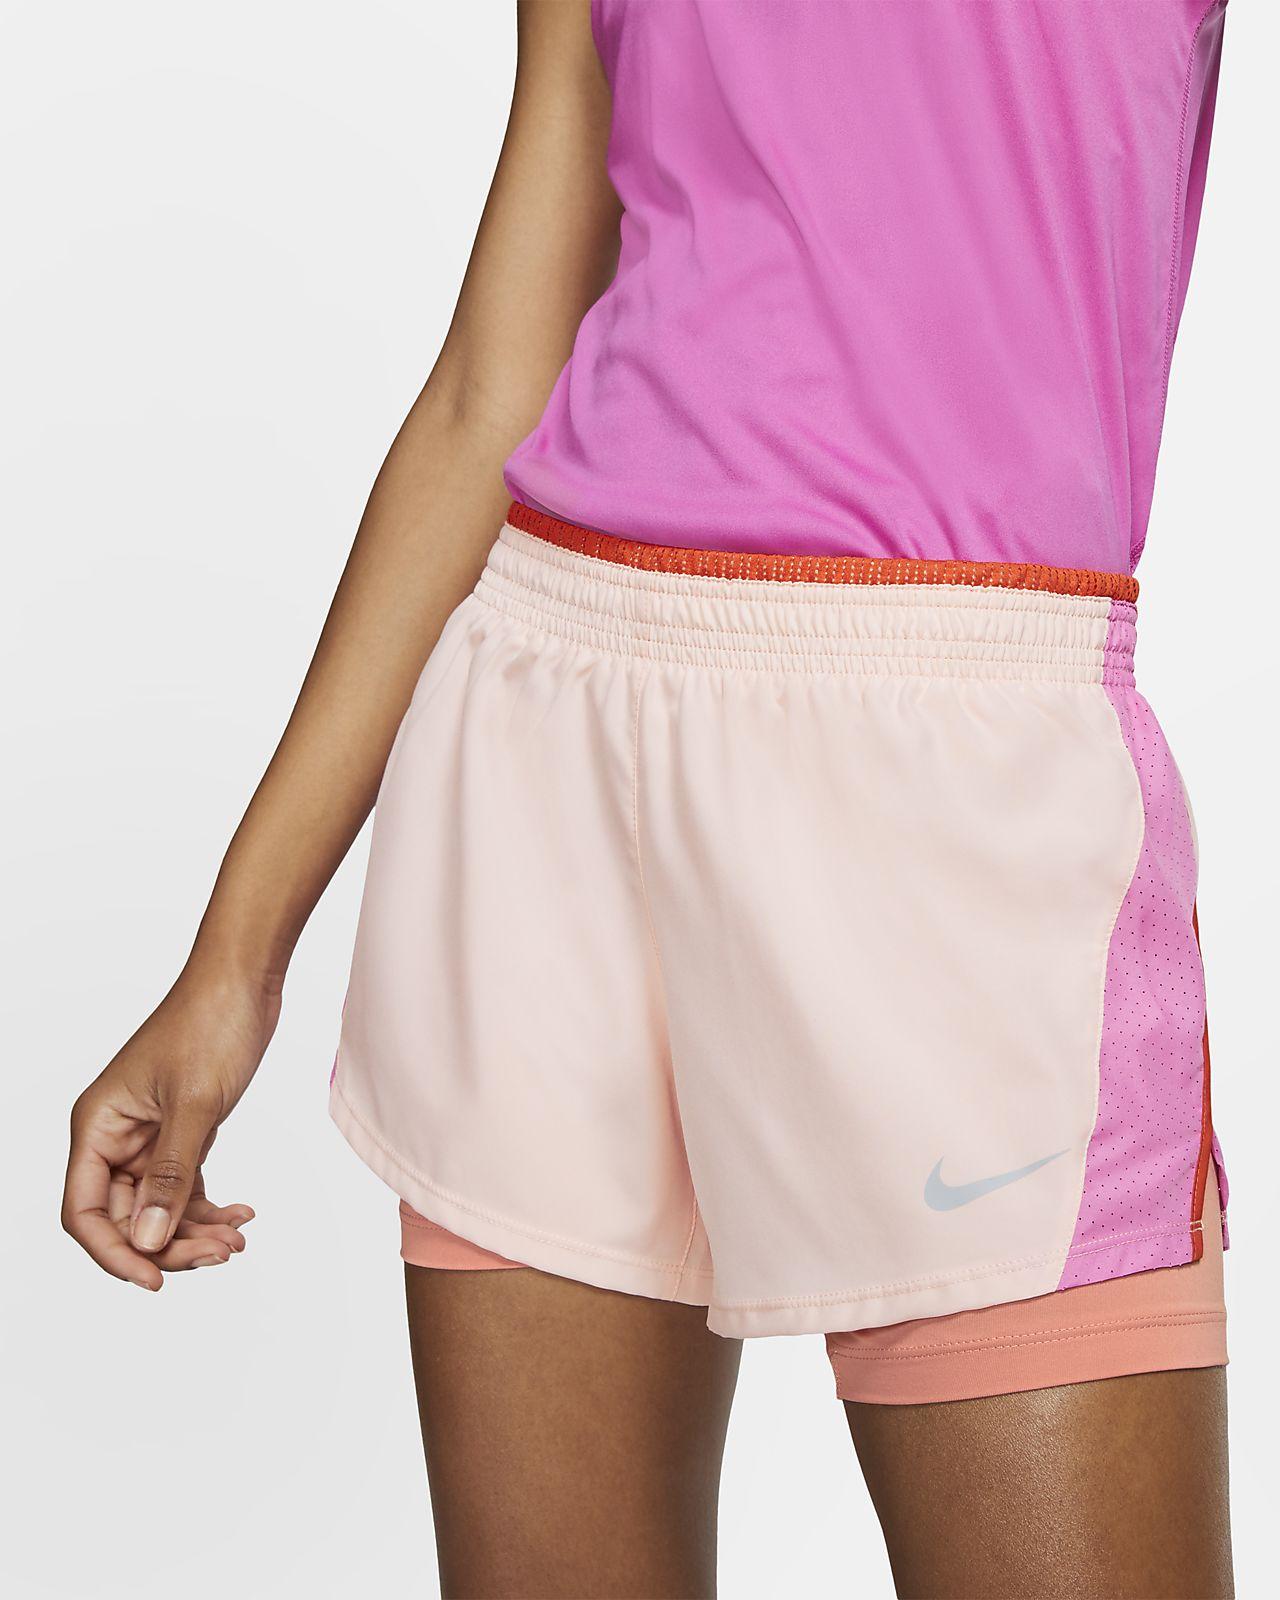 Nike 10K 2-in-1 Women's Running Shorts